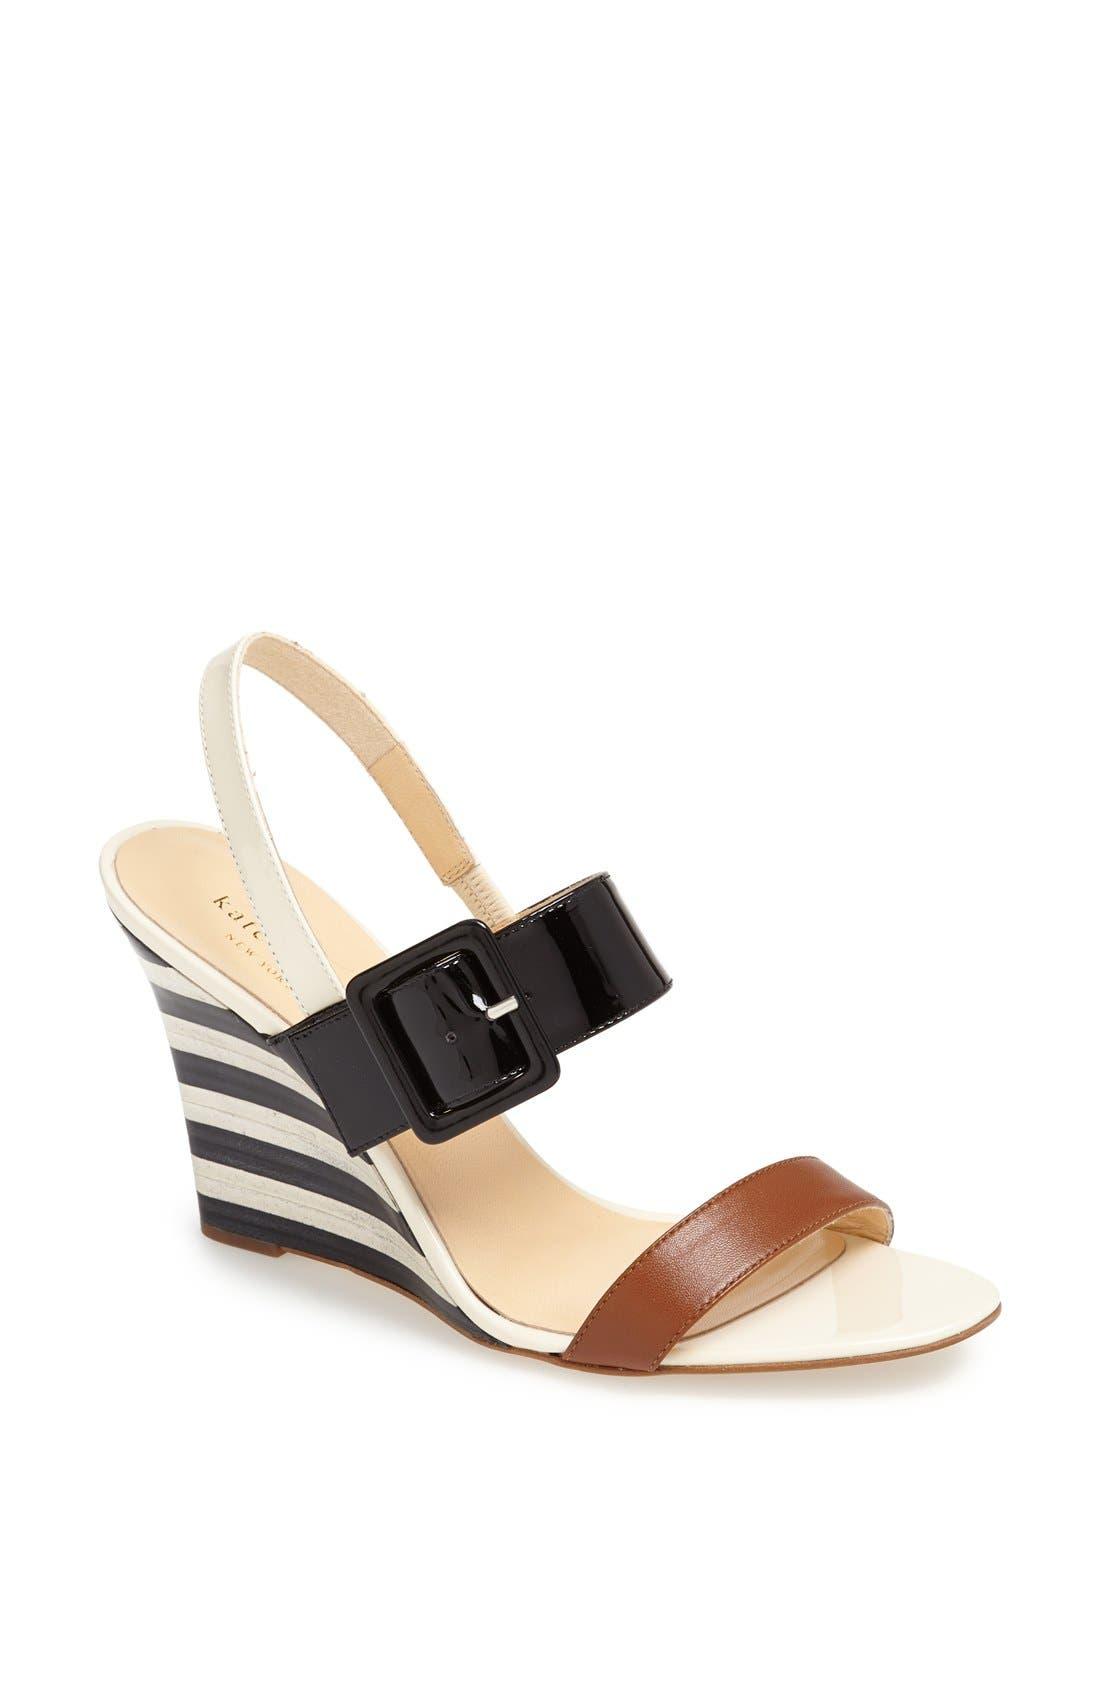 Alternate Image 1 Selected - kate spade new york 'isola' wedge sandal